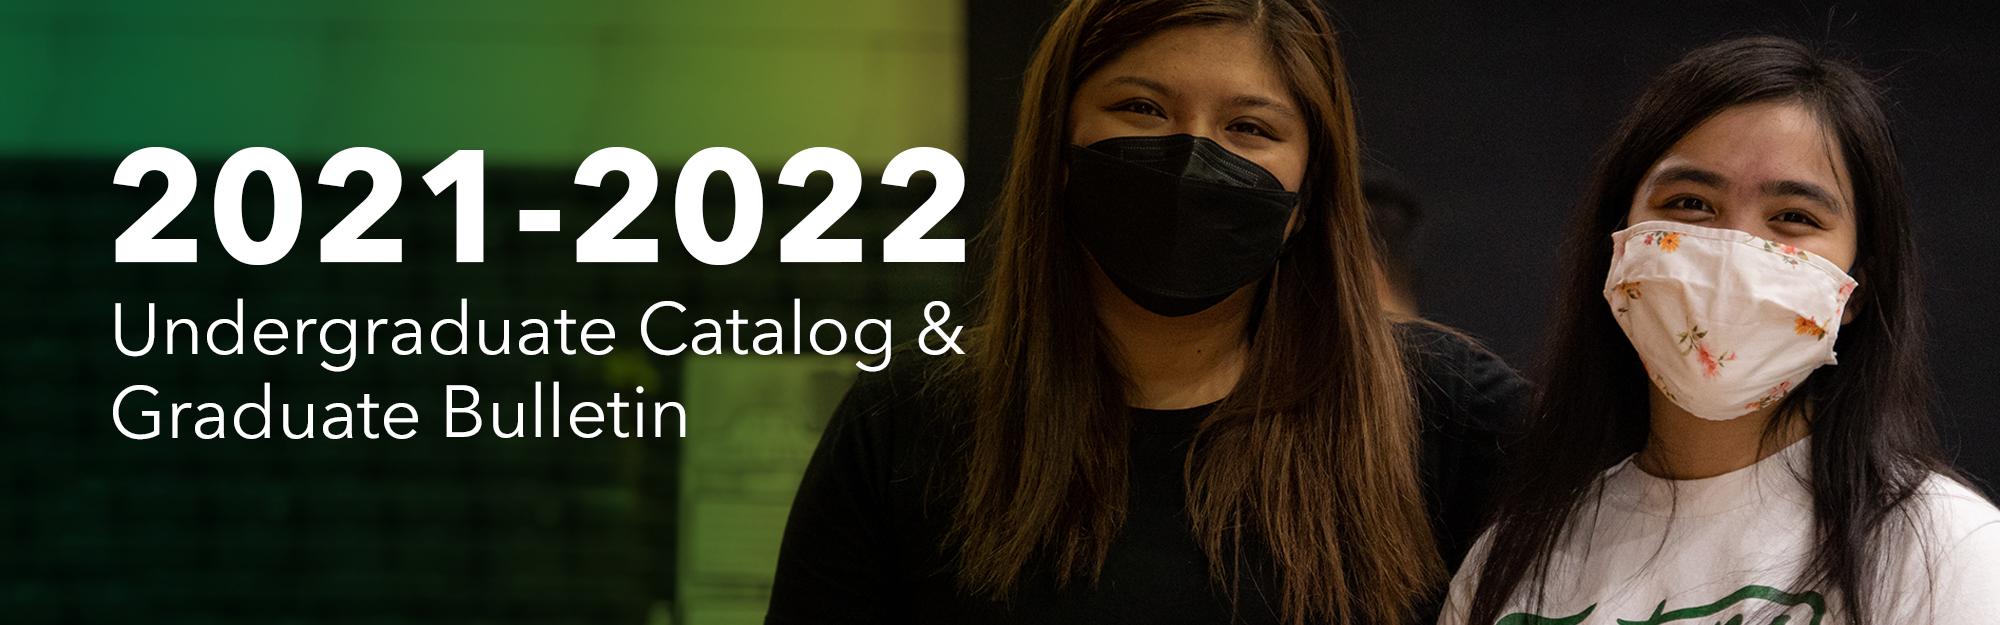 This is the University of Guam's online 2021-2022 Undergraduate Catalog and Graduate Bulletin